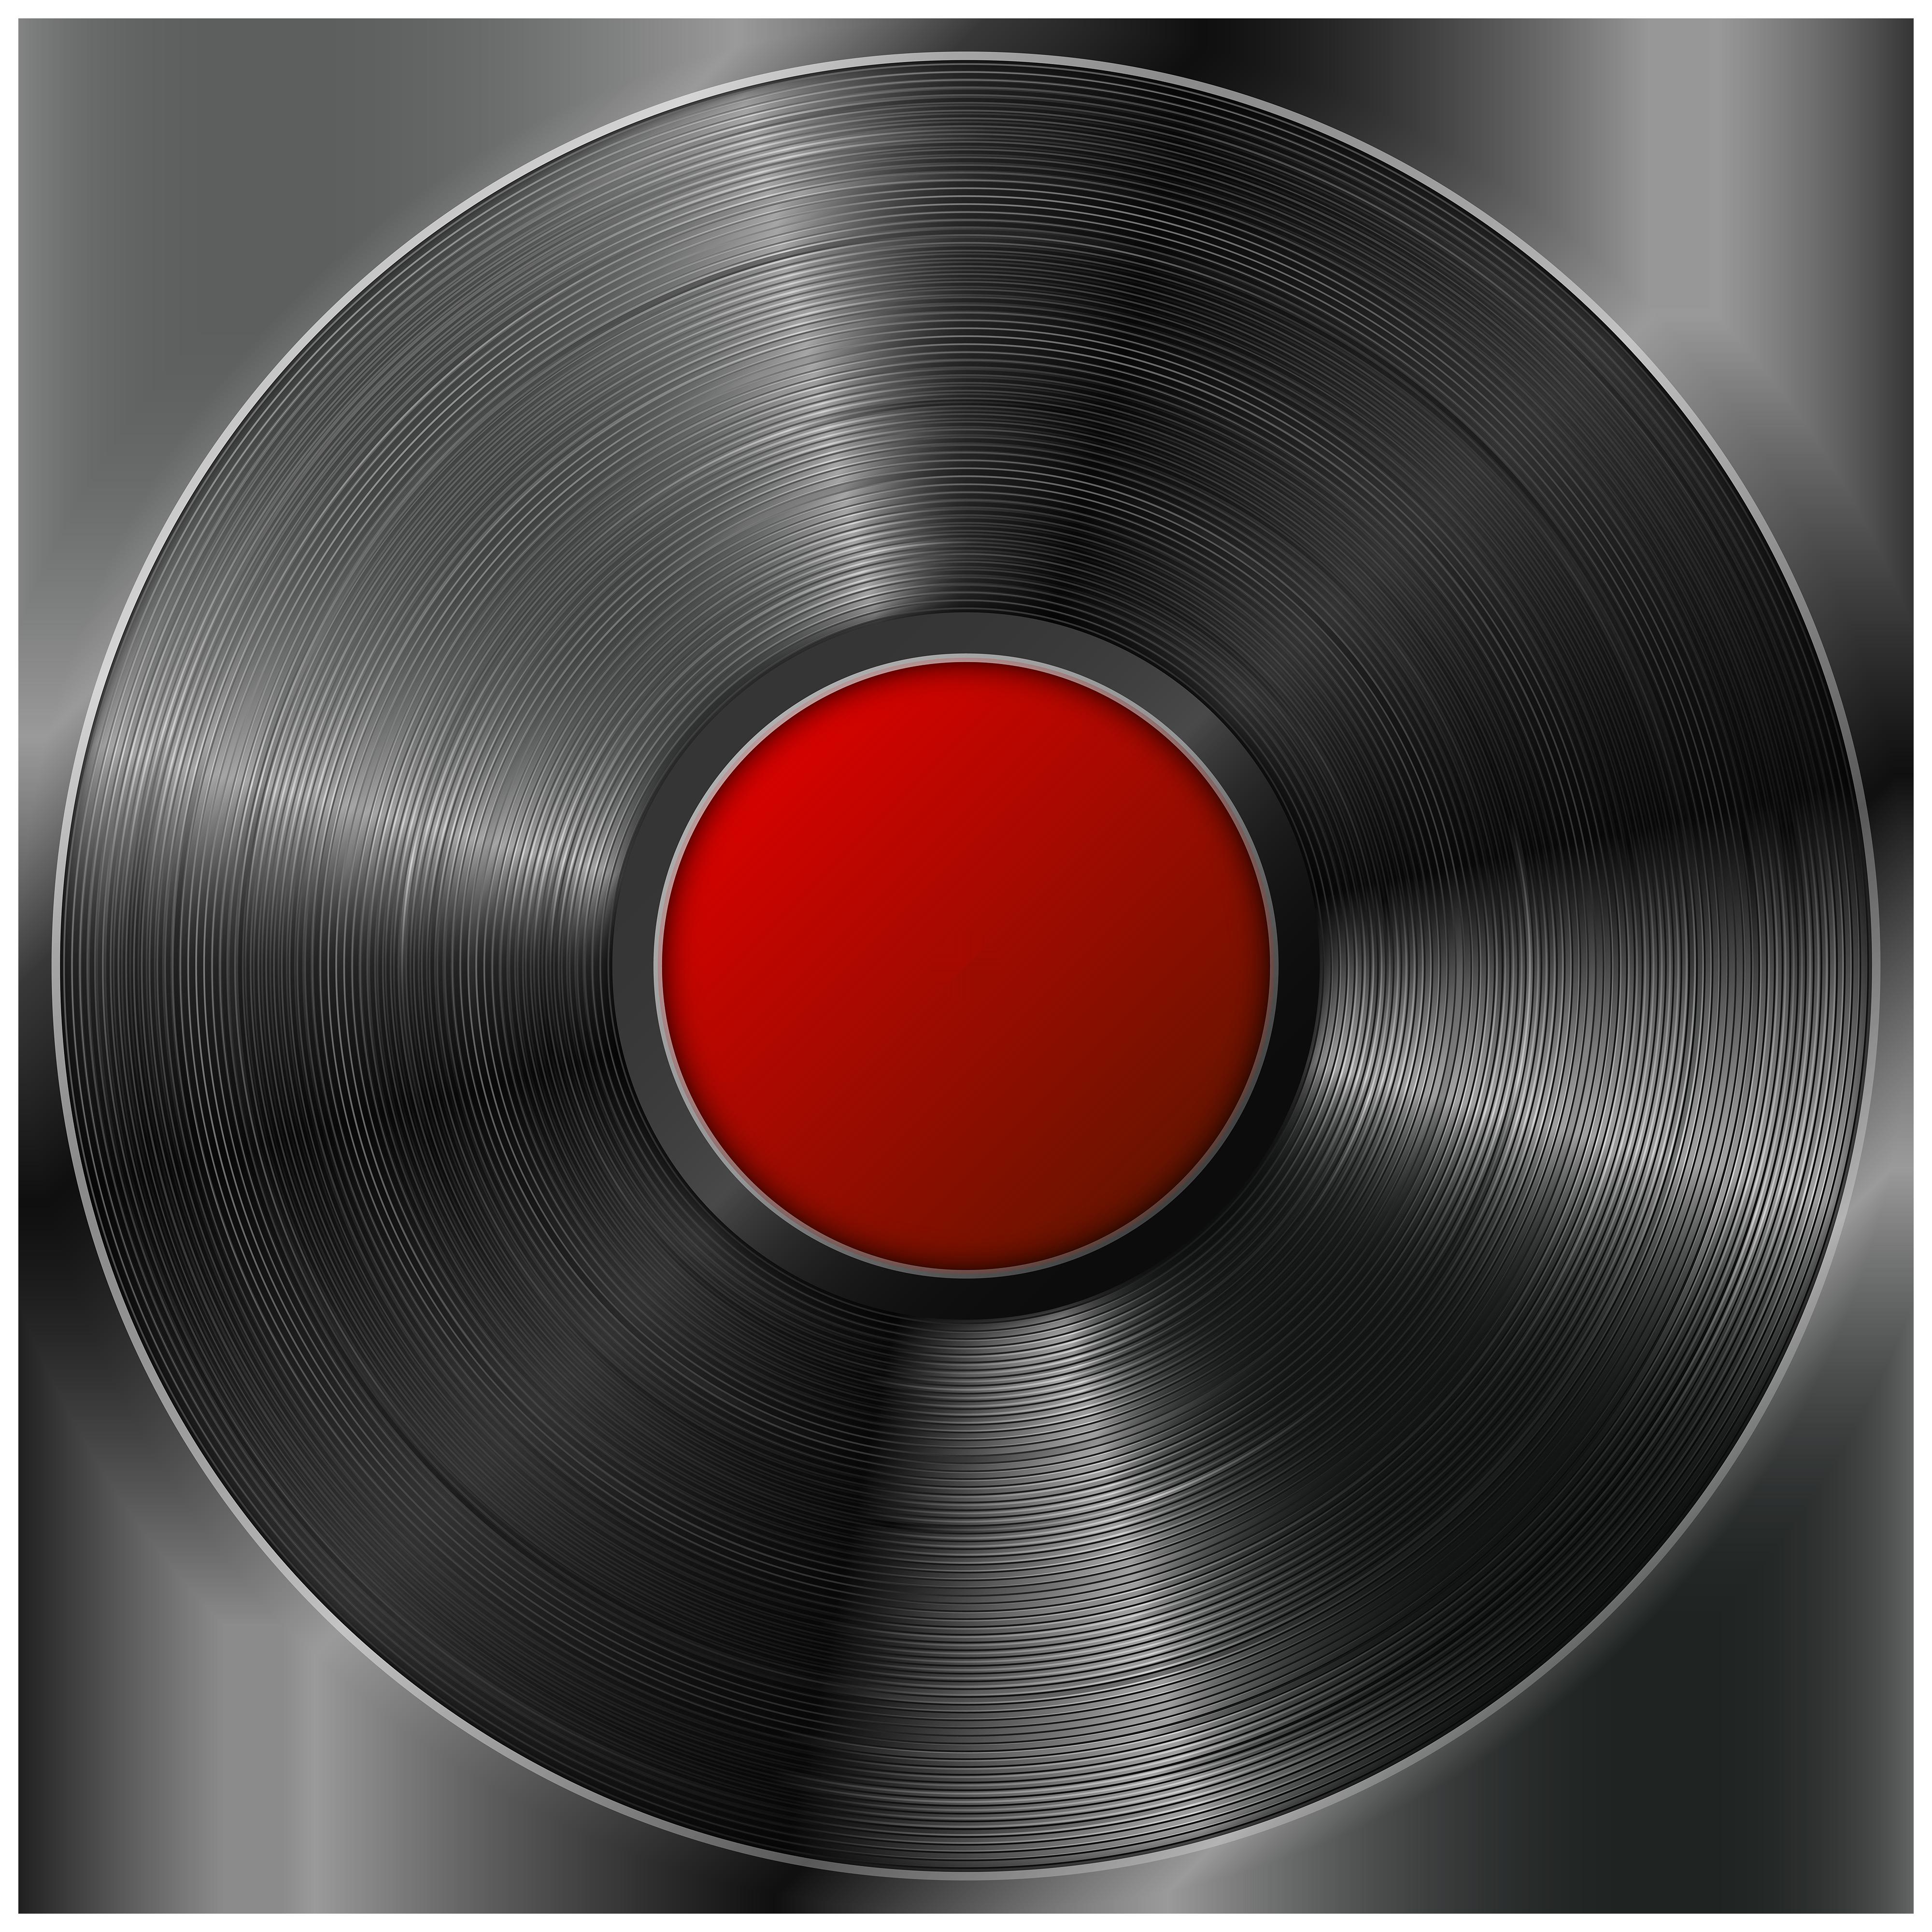 Gramophone Vinyl LP Record PNG Transparent Clip Art Image.